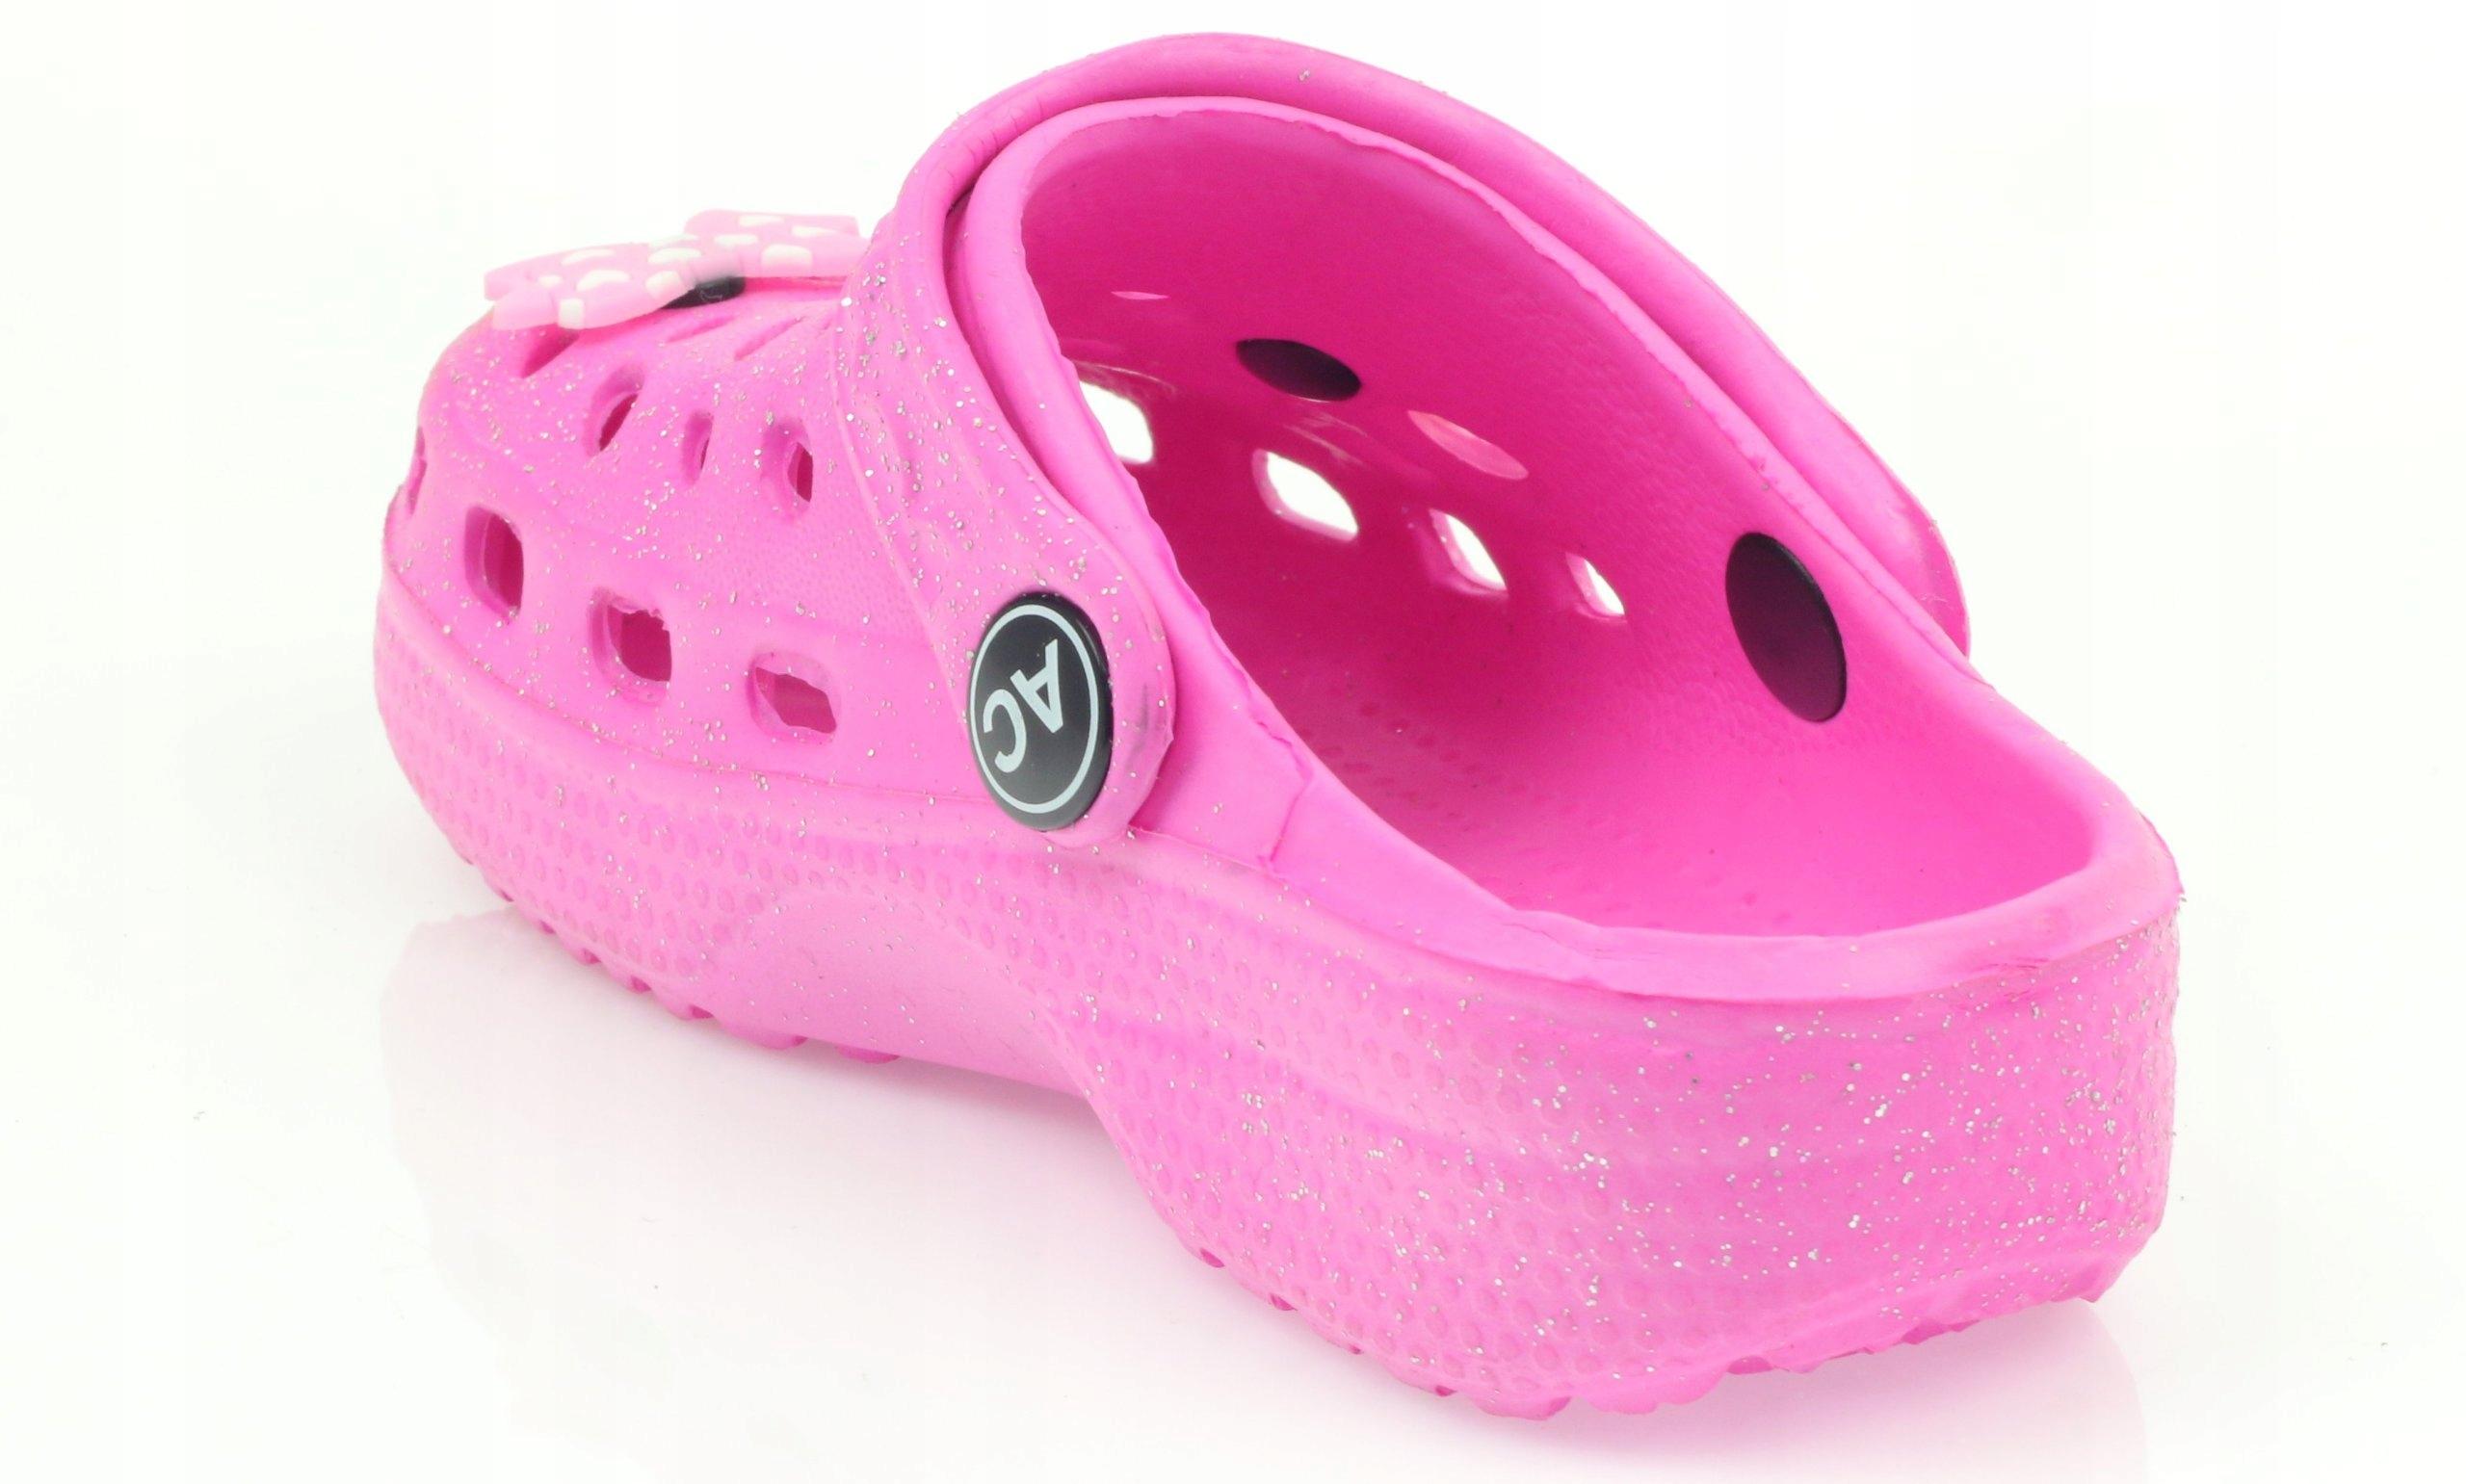 Crocs klapki kroksy różowe American r.30 - 7396561829 - oficjalne ... d2e14a711a